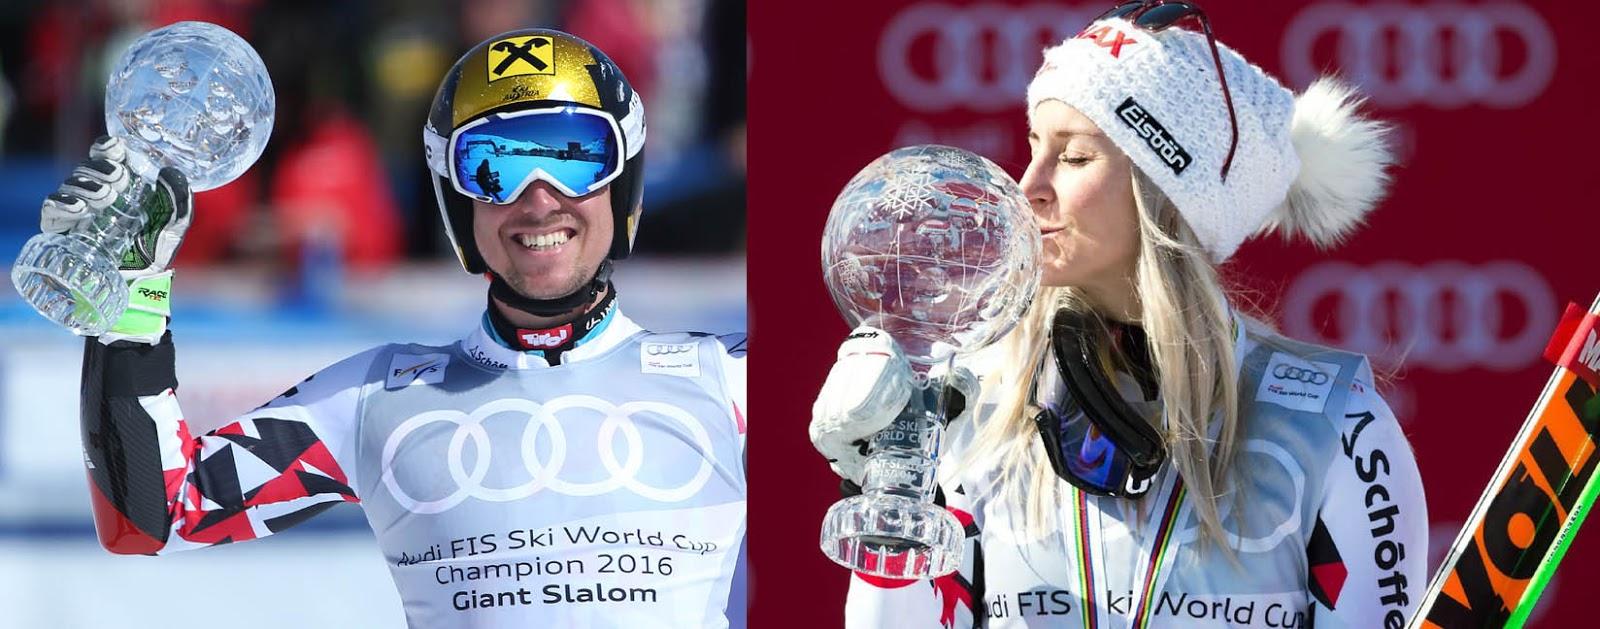 Brem, Hirscher St Moritz 2016 globus